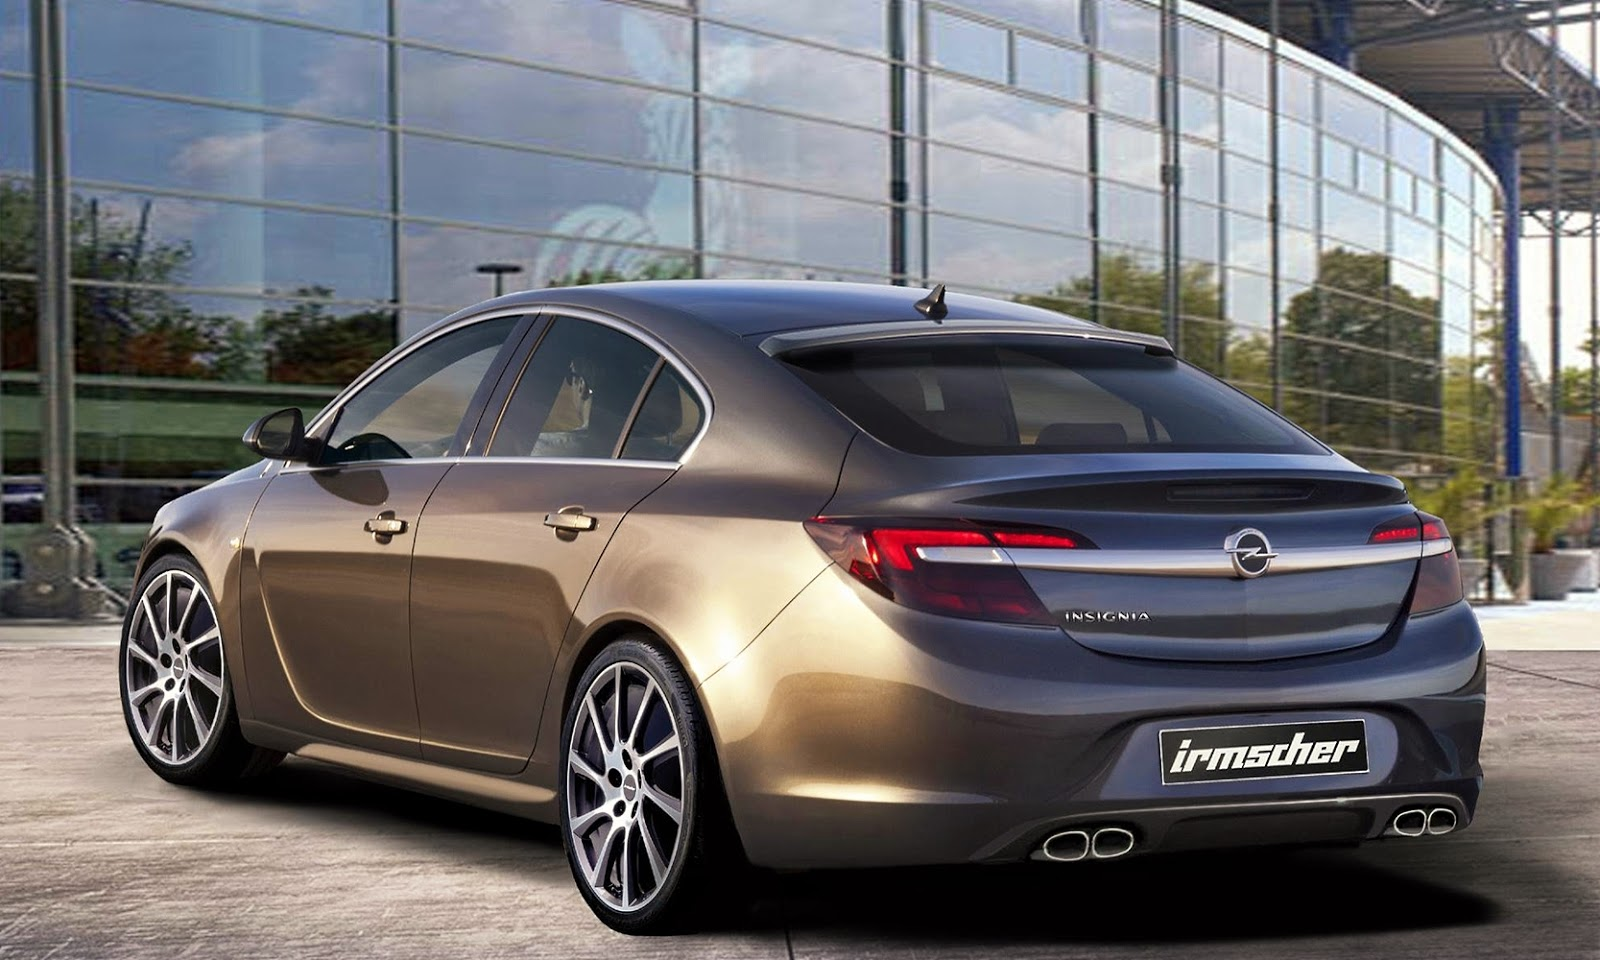 Irmscher veredelt Opel Insignia Facelift | autofilou